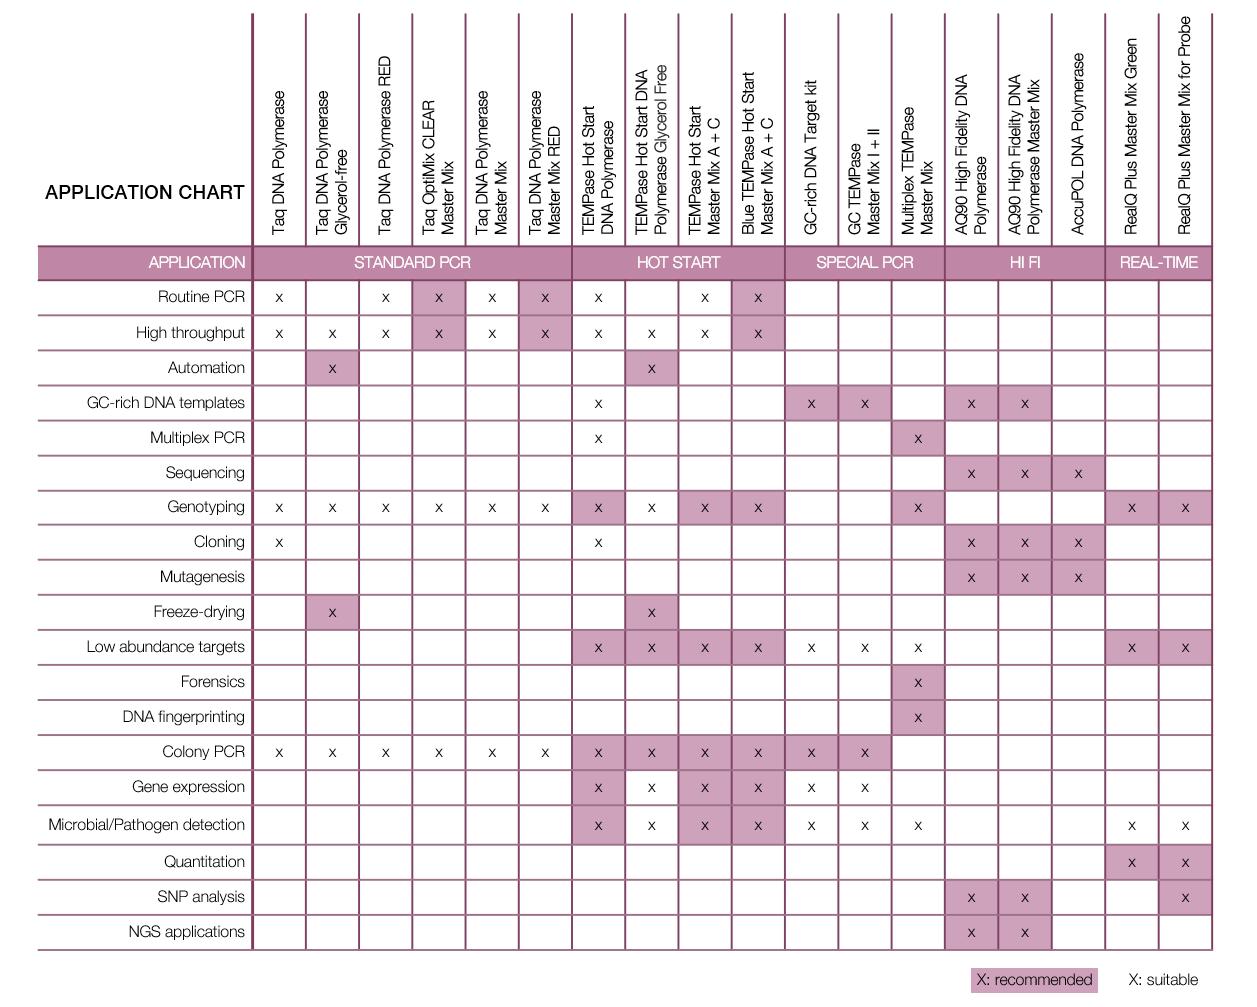 Application charts